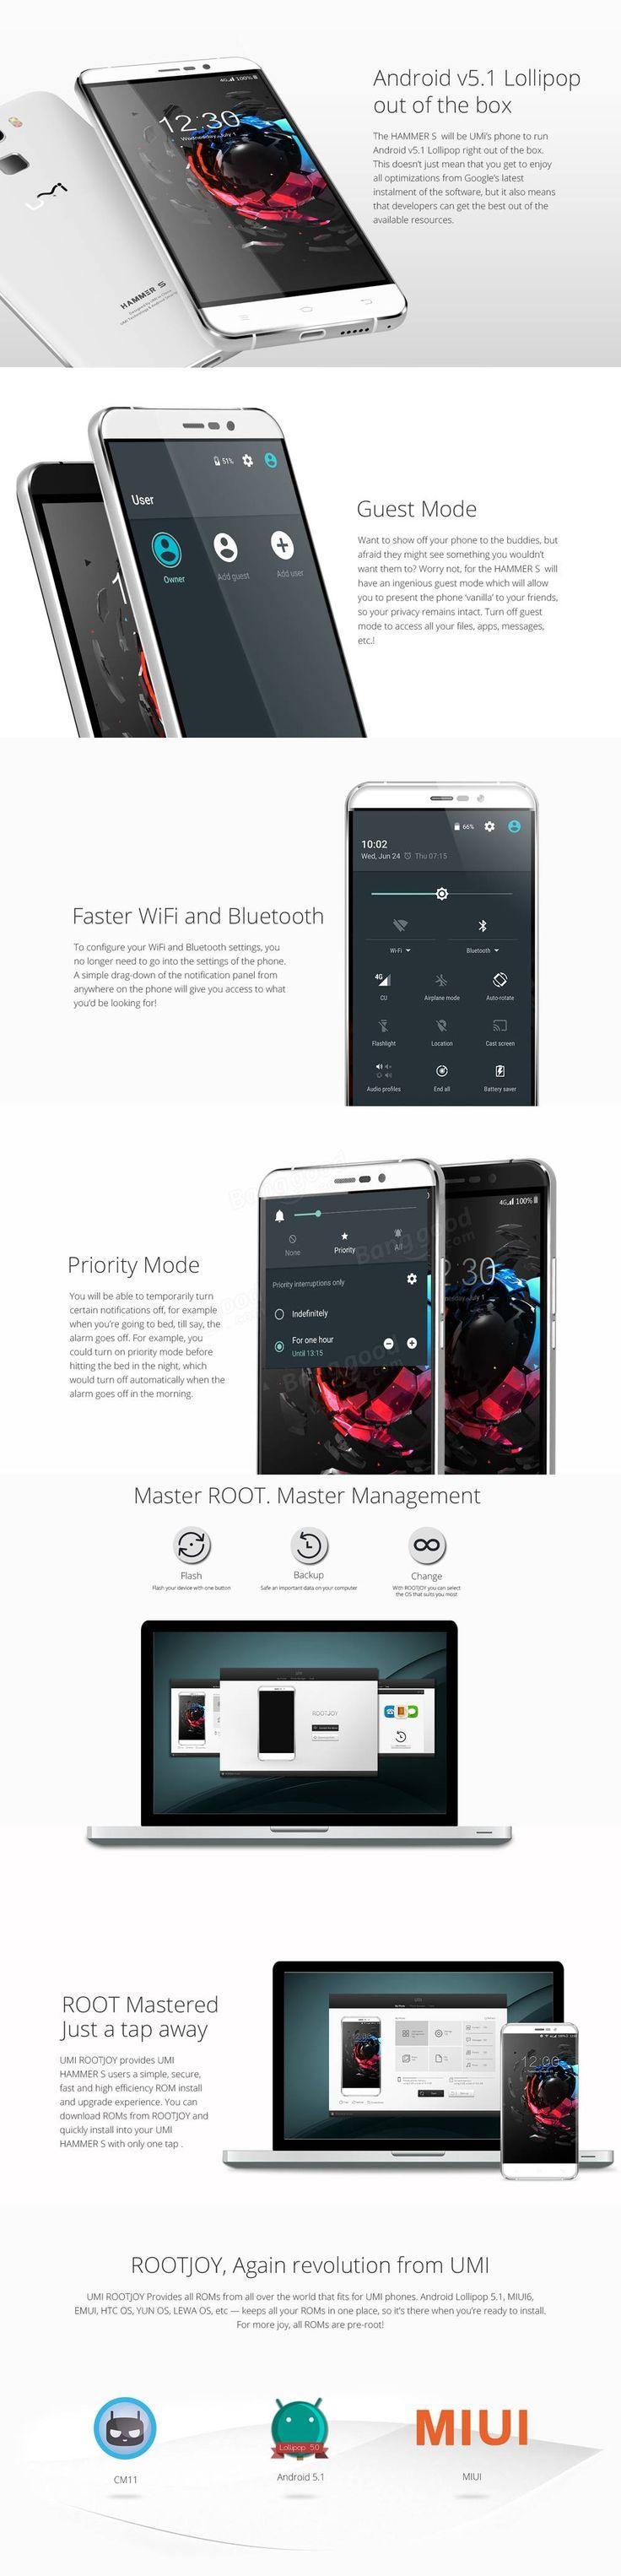 UMI Hammer S 5.5-inch 2GB RAM MTK6735 Quad Core 64Bit 4G Smartphone Sale - Banggood.com